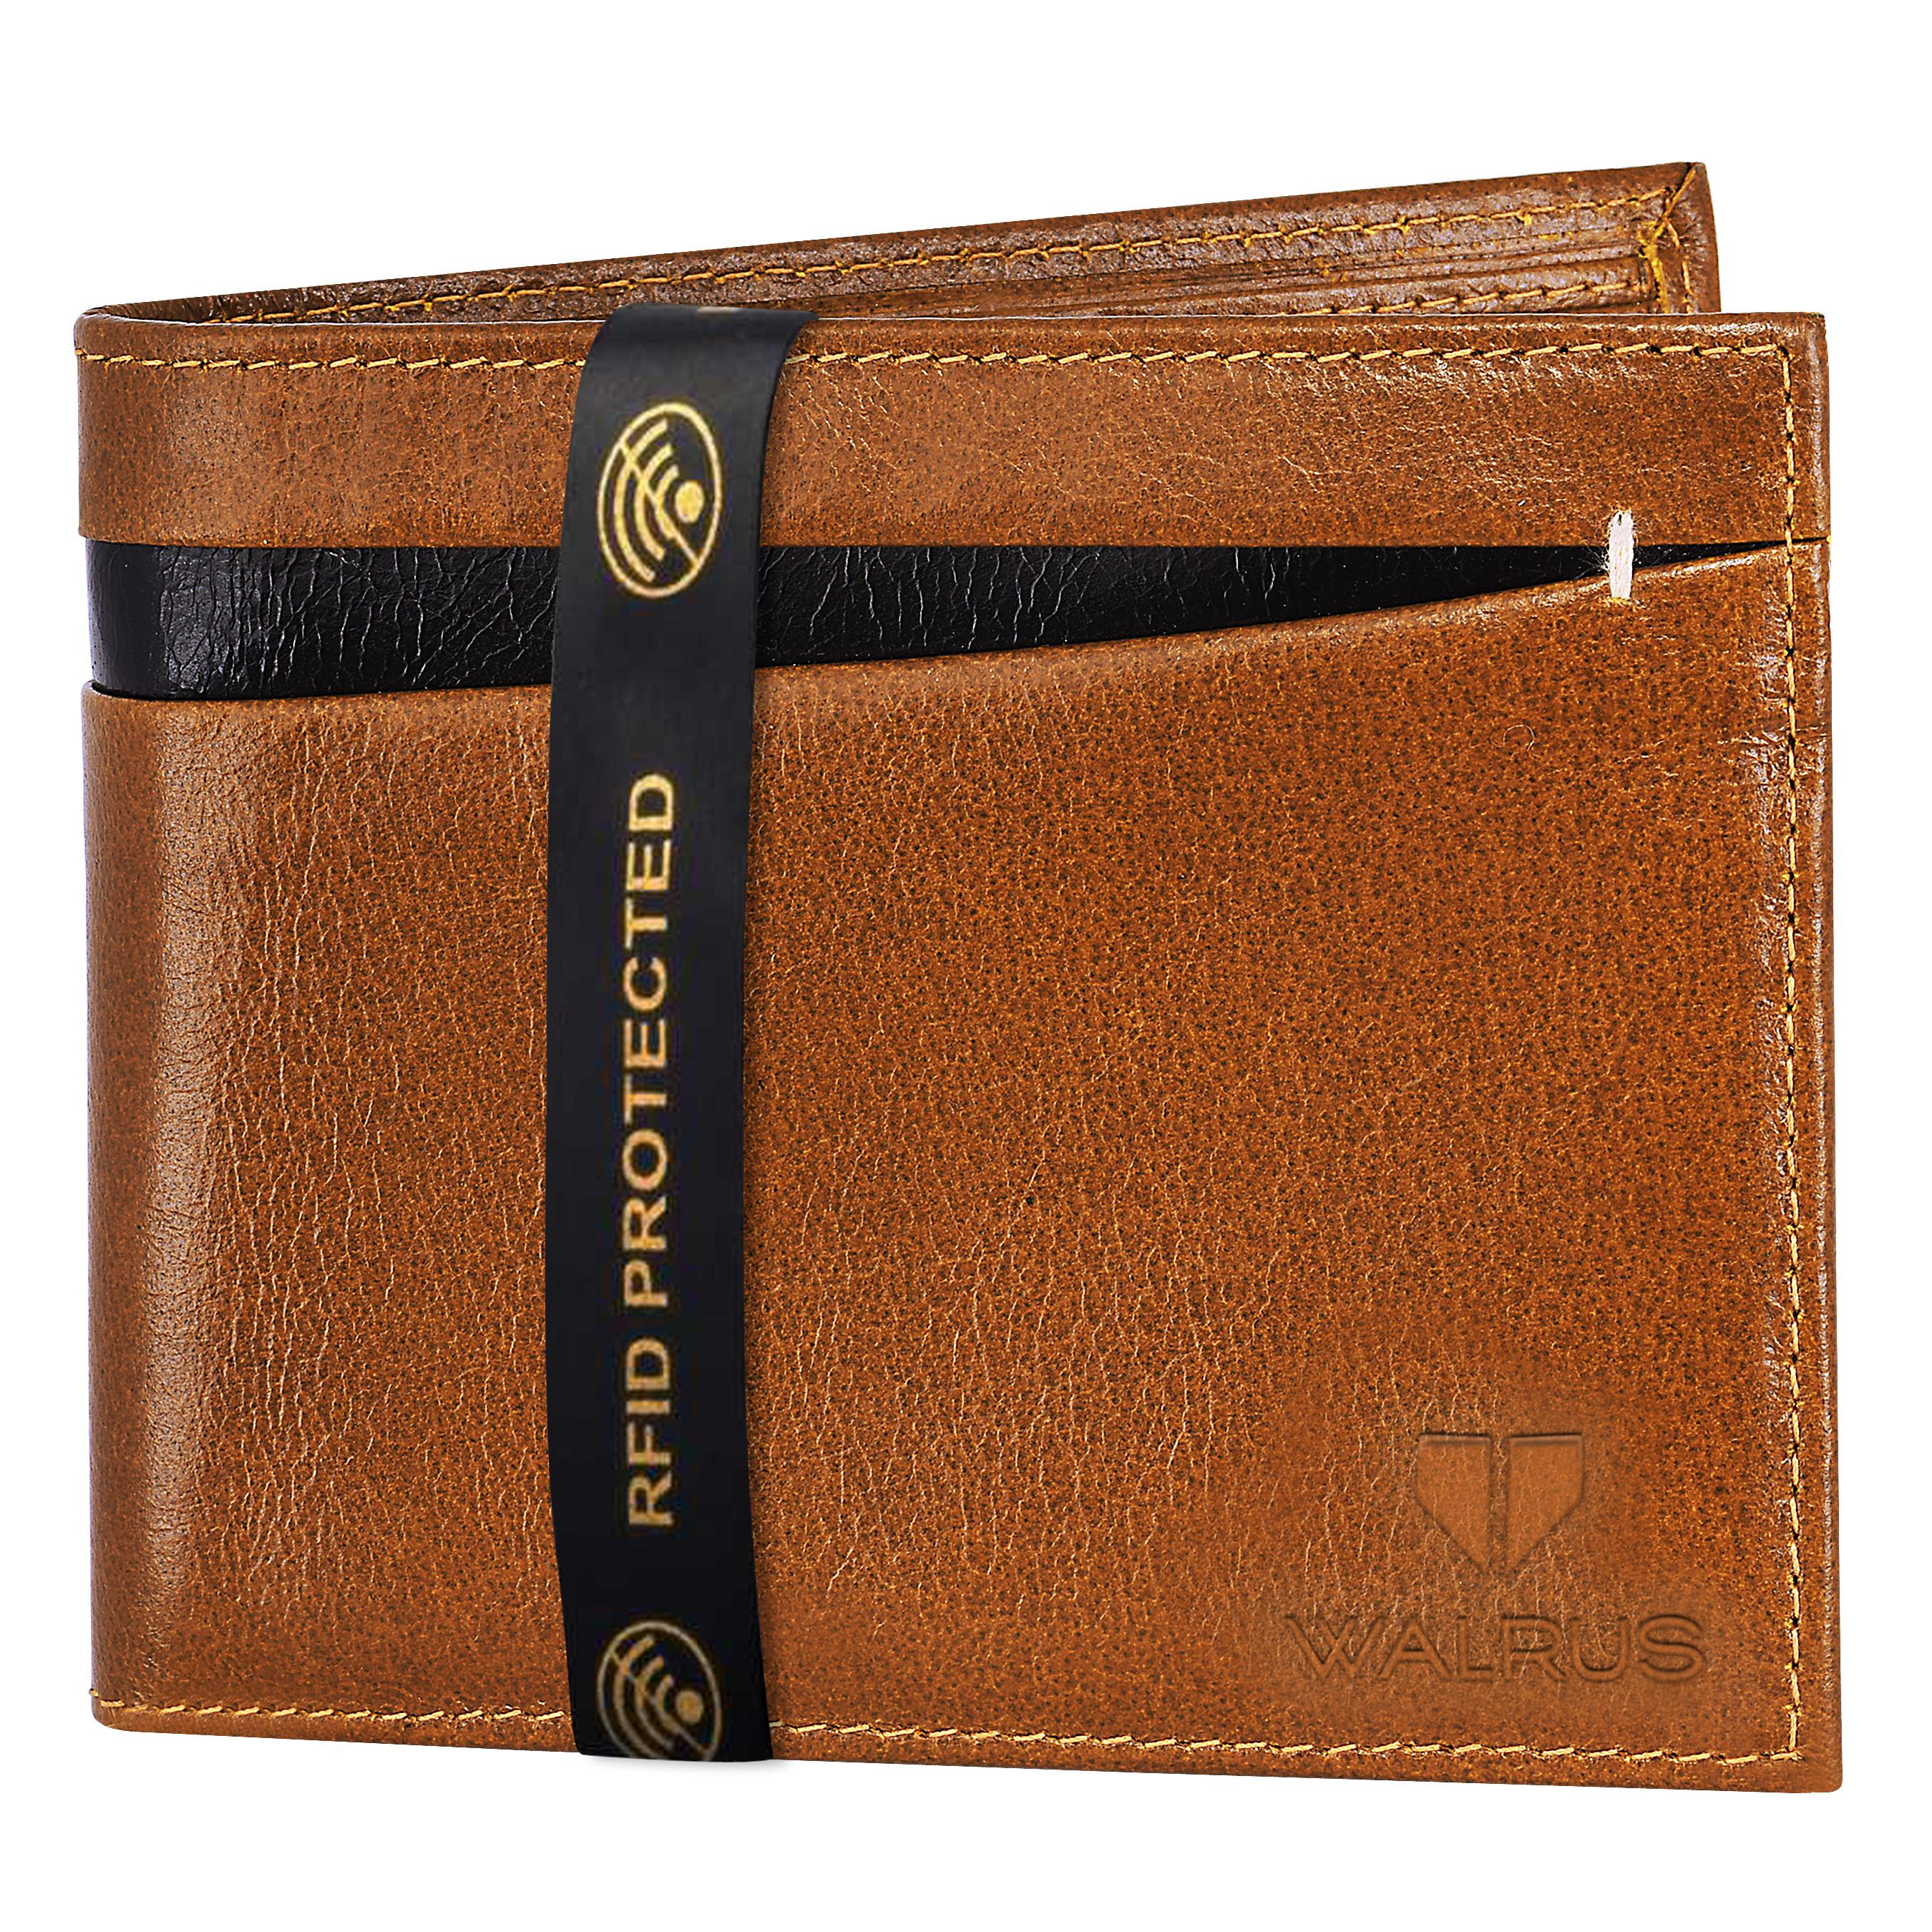 Walrus | Walrus Elite III Beige Premium Genuine Leather Men Wallet With RFID Protection.